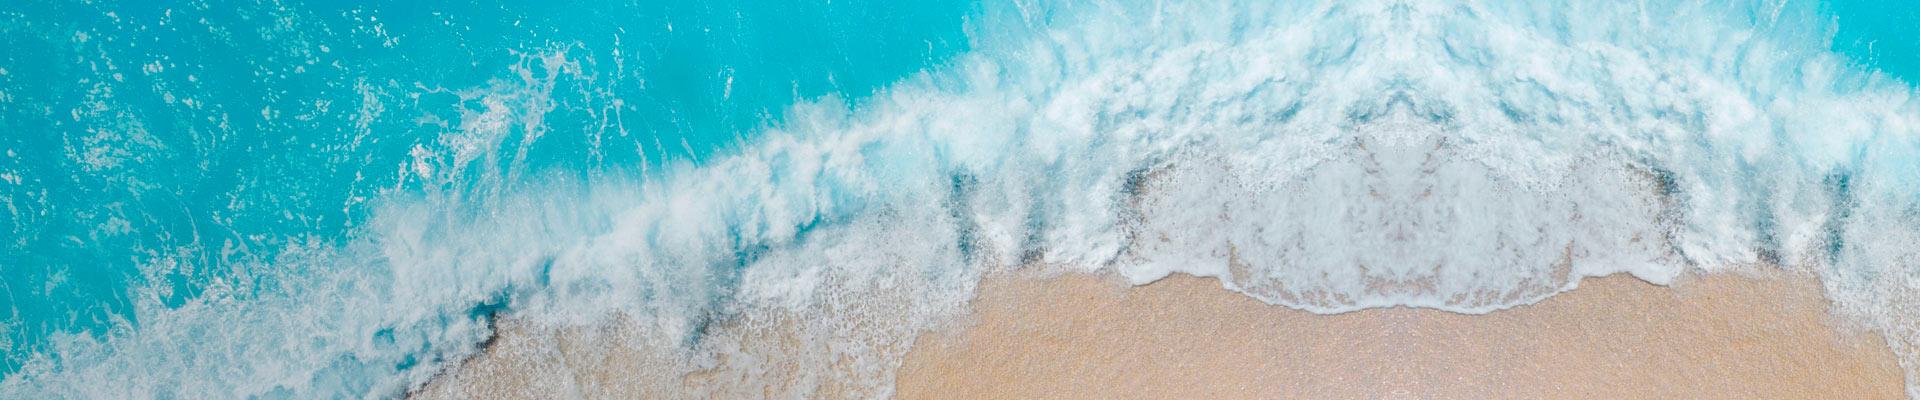 oferta viajes Verano 2020